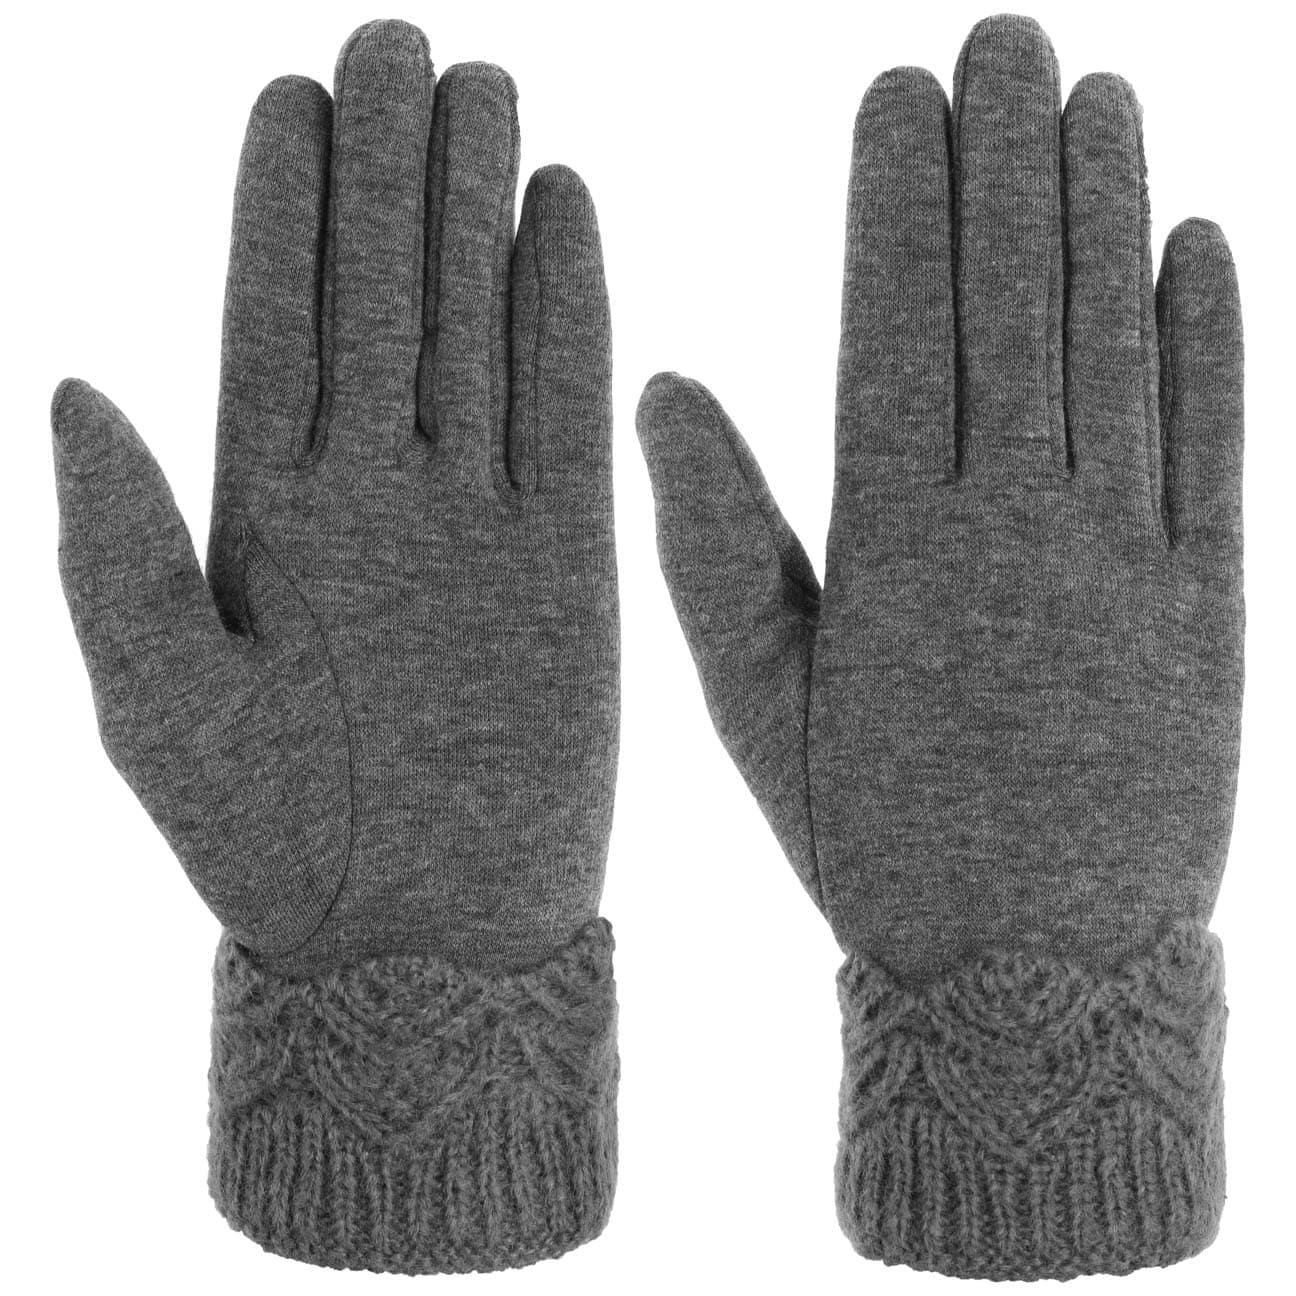 Guantes de Mujer Ribbed Edge by Lipodo  guantes de algod?n